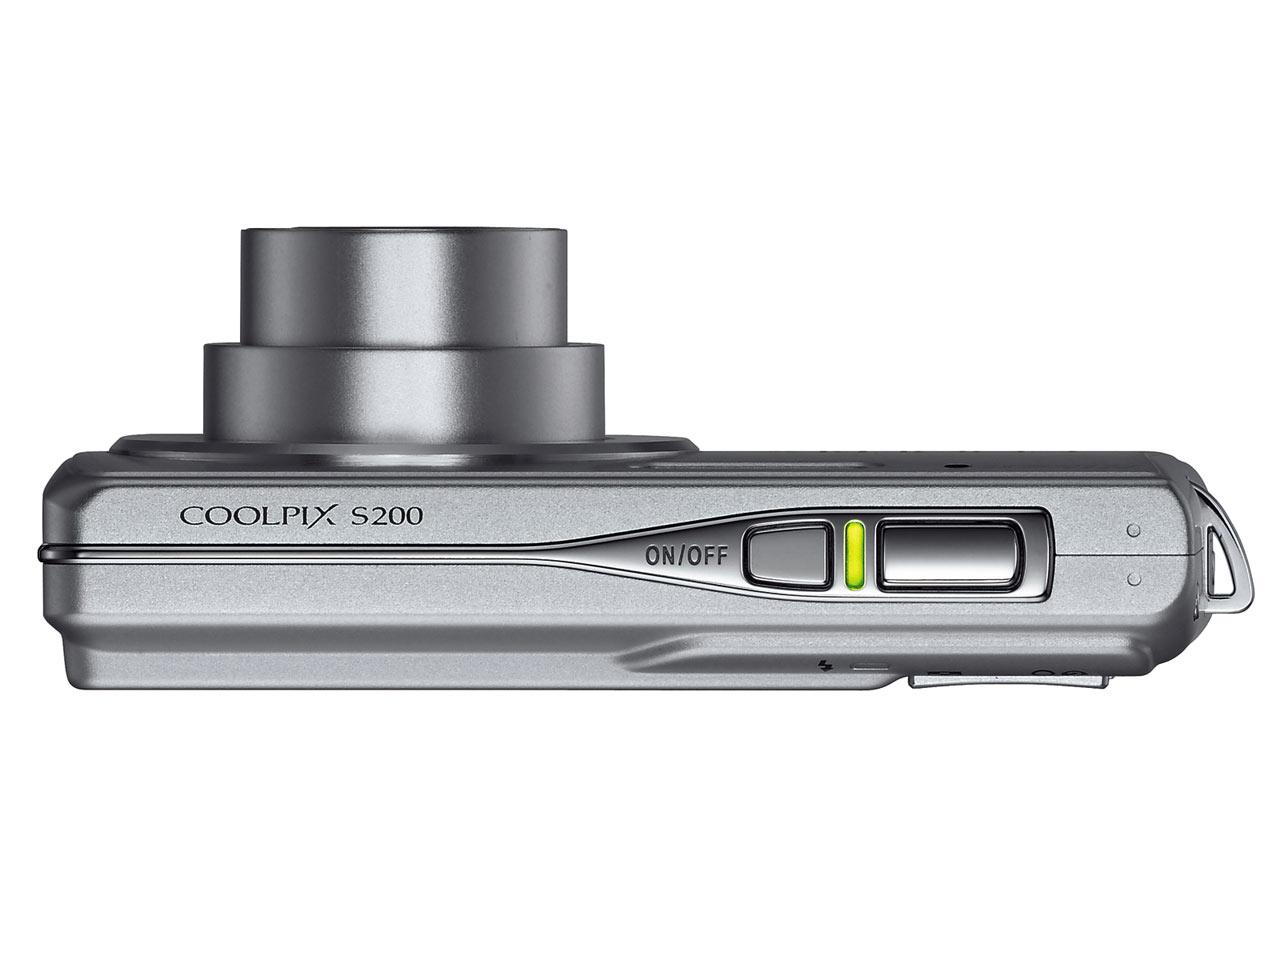 nikon coolpix s200 digital photography review rh dpreview com Nikon Coolpix L20 nikon coolpix s200 manual pdf